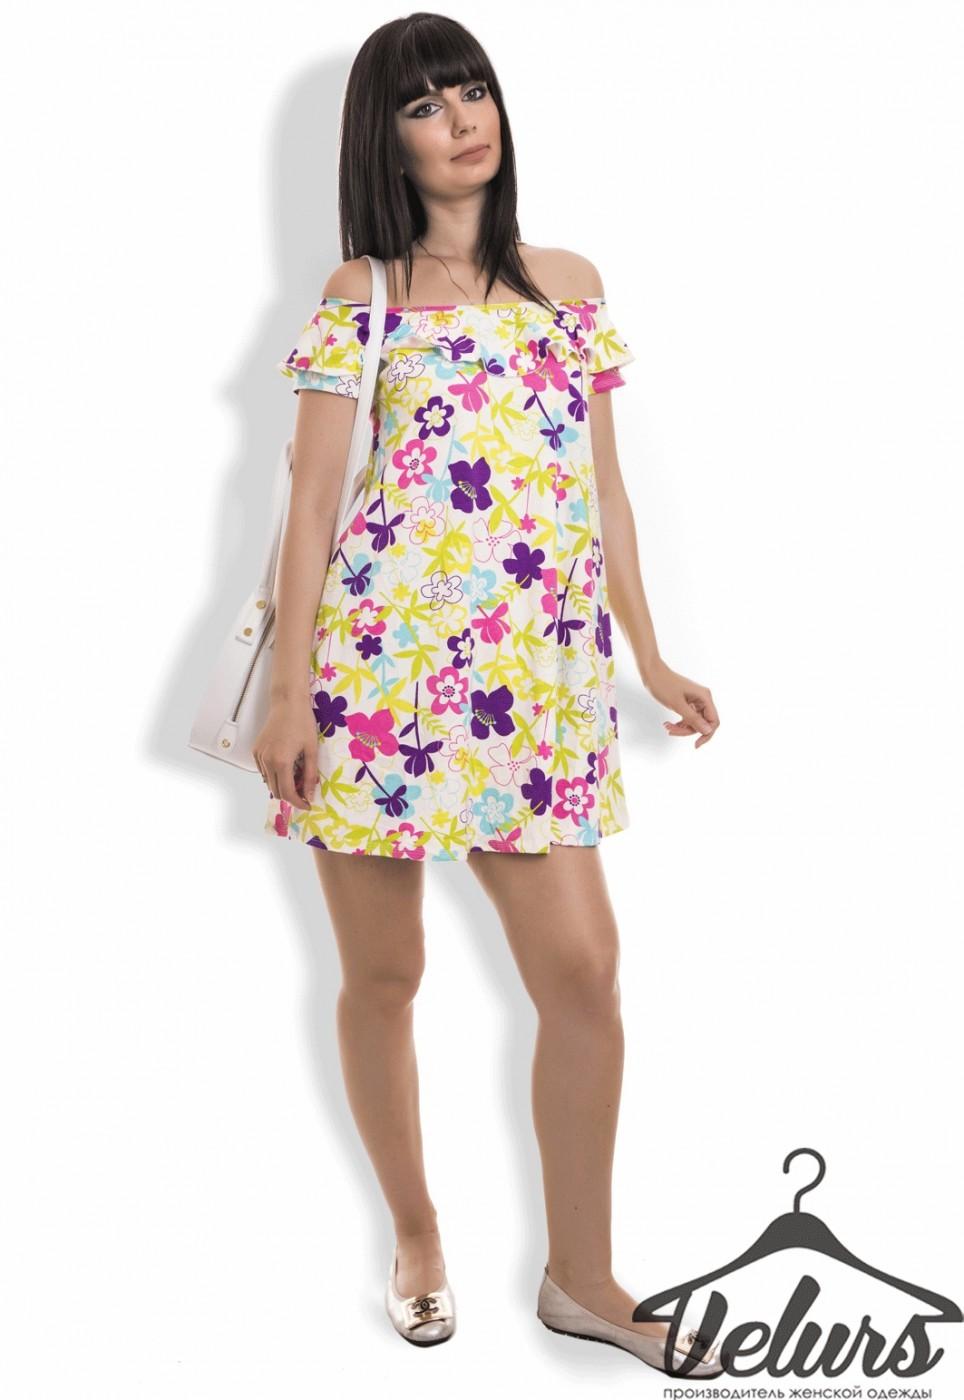 Velurs: Платье 21967 - фото 1